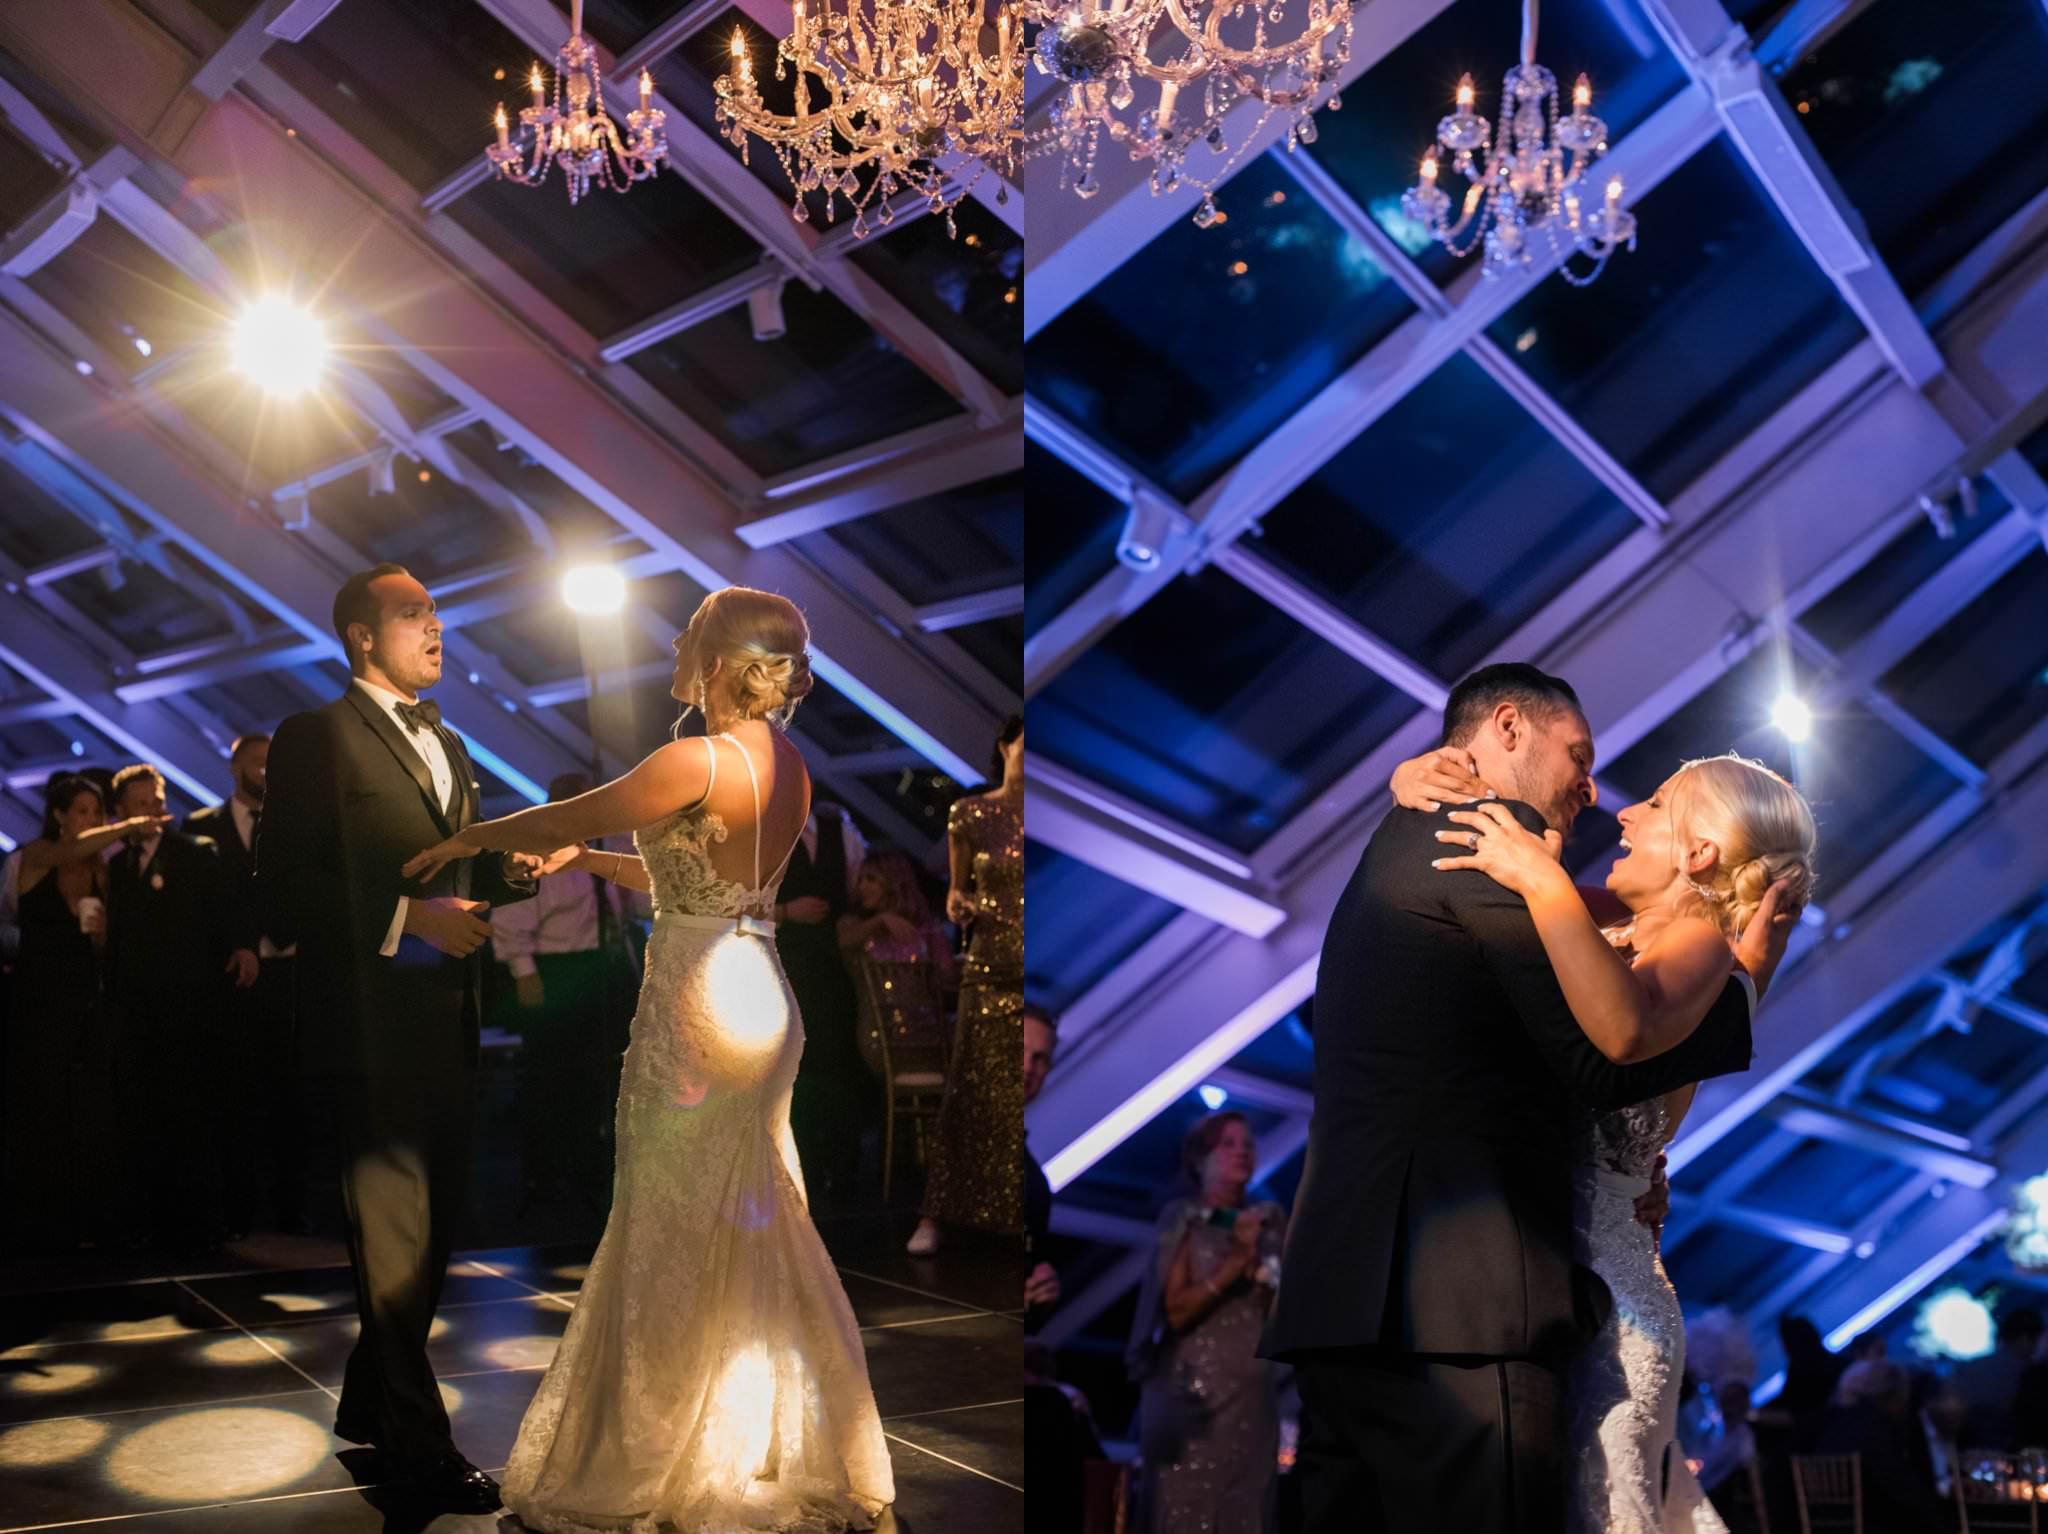 Adler-Planetarium-Chicago-Wedding-Photography-0109.JPG